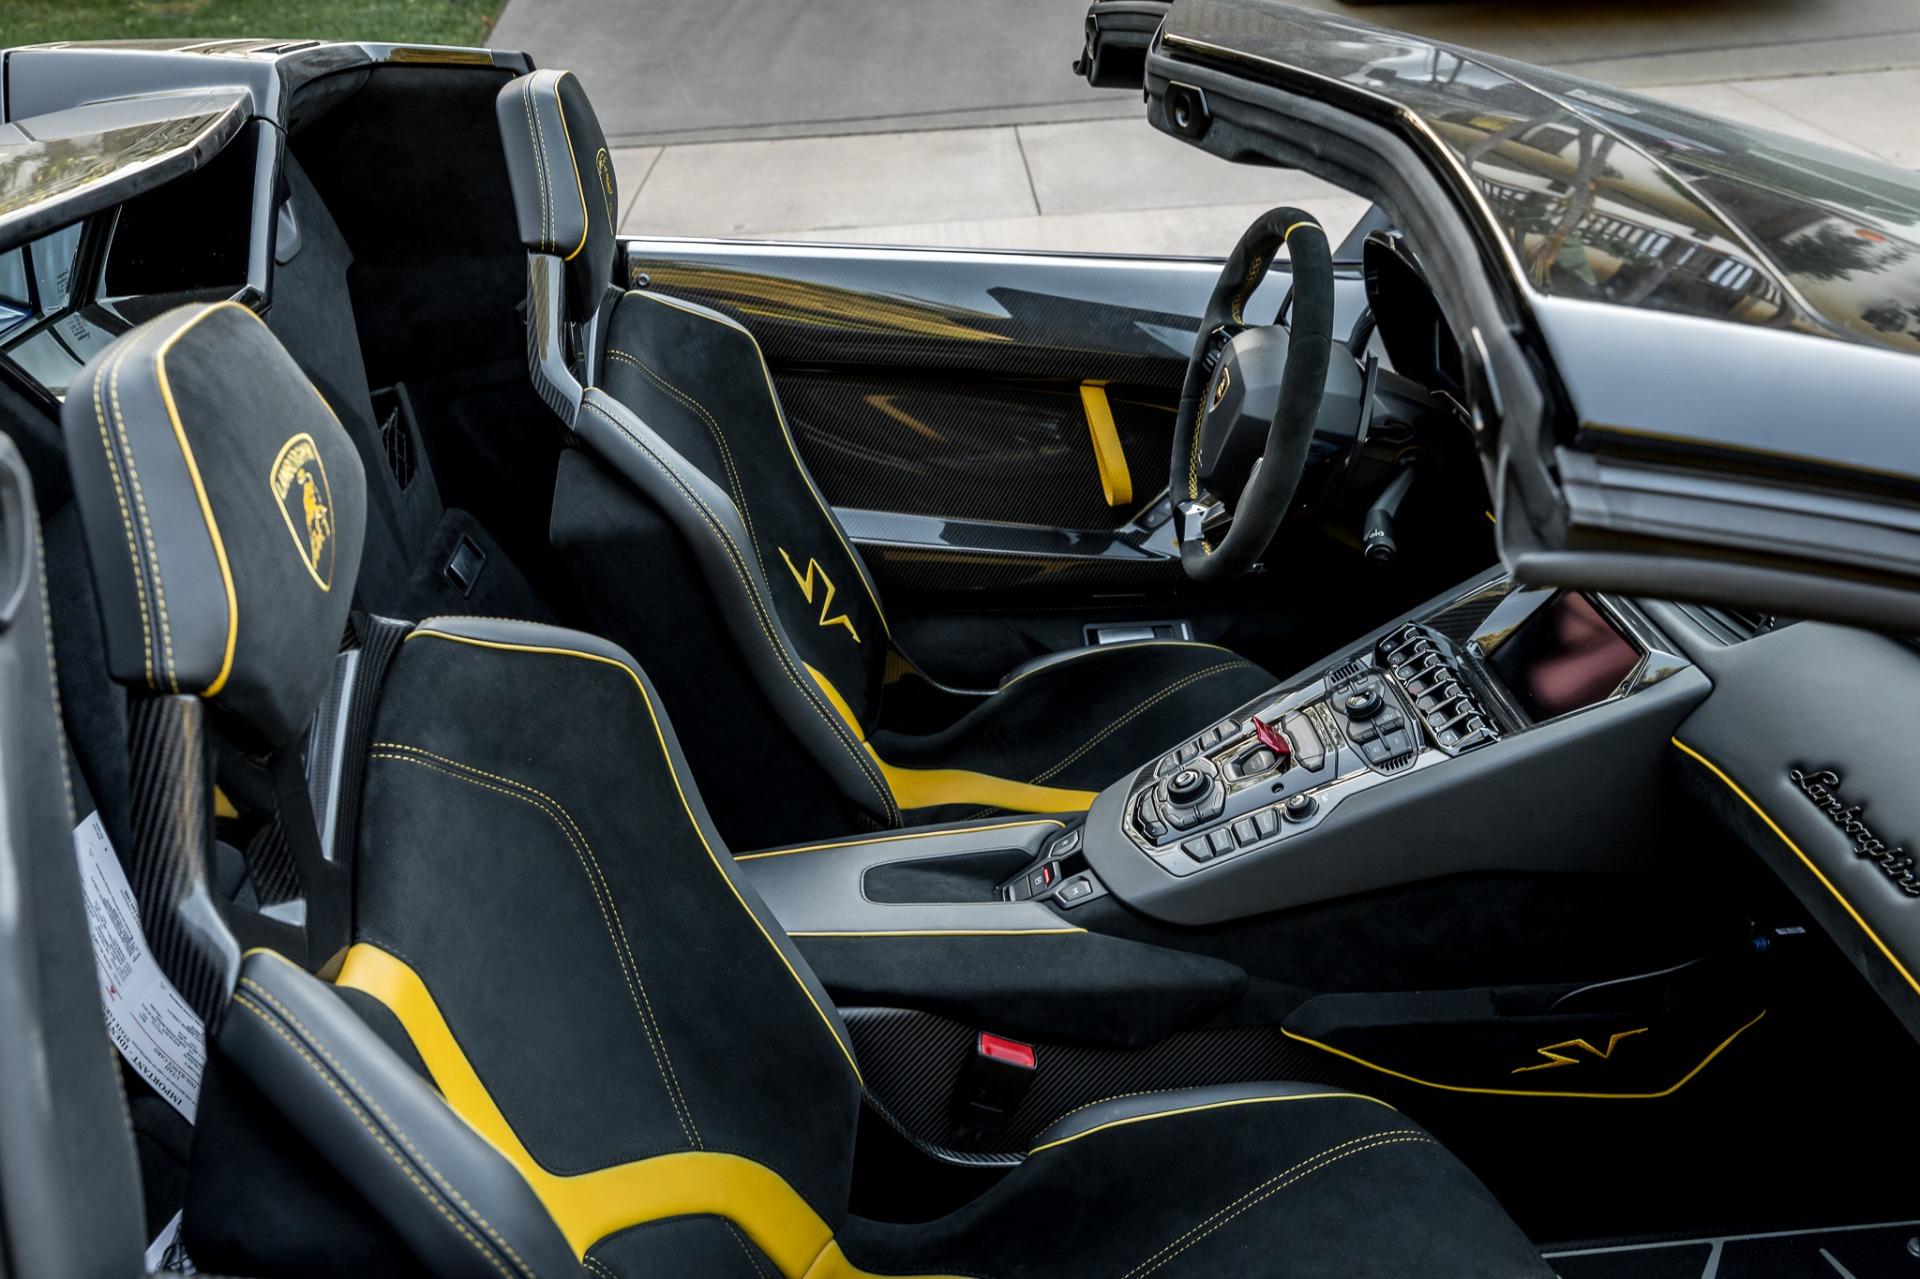 Used 2017 Lamborghini Aventador LP 750-4 SV / 740HP / AWD / 1930 MI / NAV / CAMERA for sale Sold at Formula Imports in Charlotte NC 28227 15